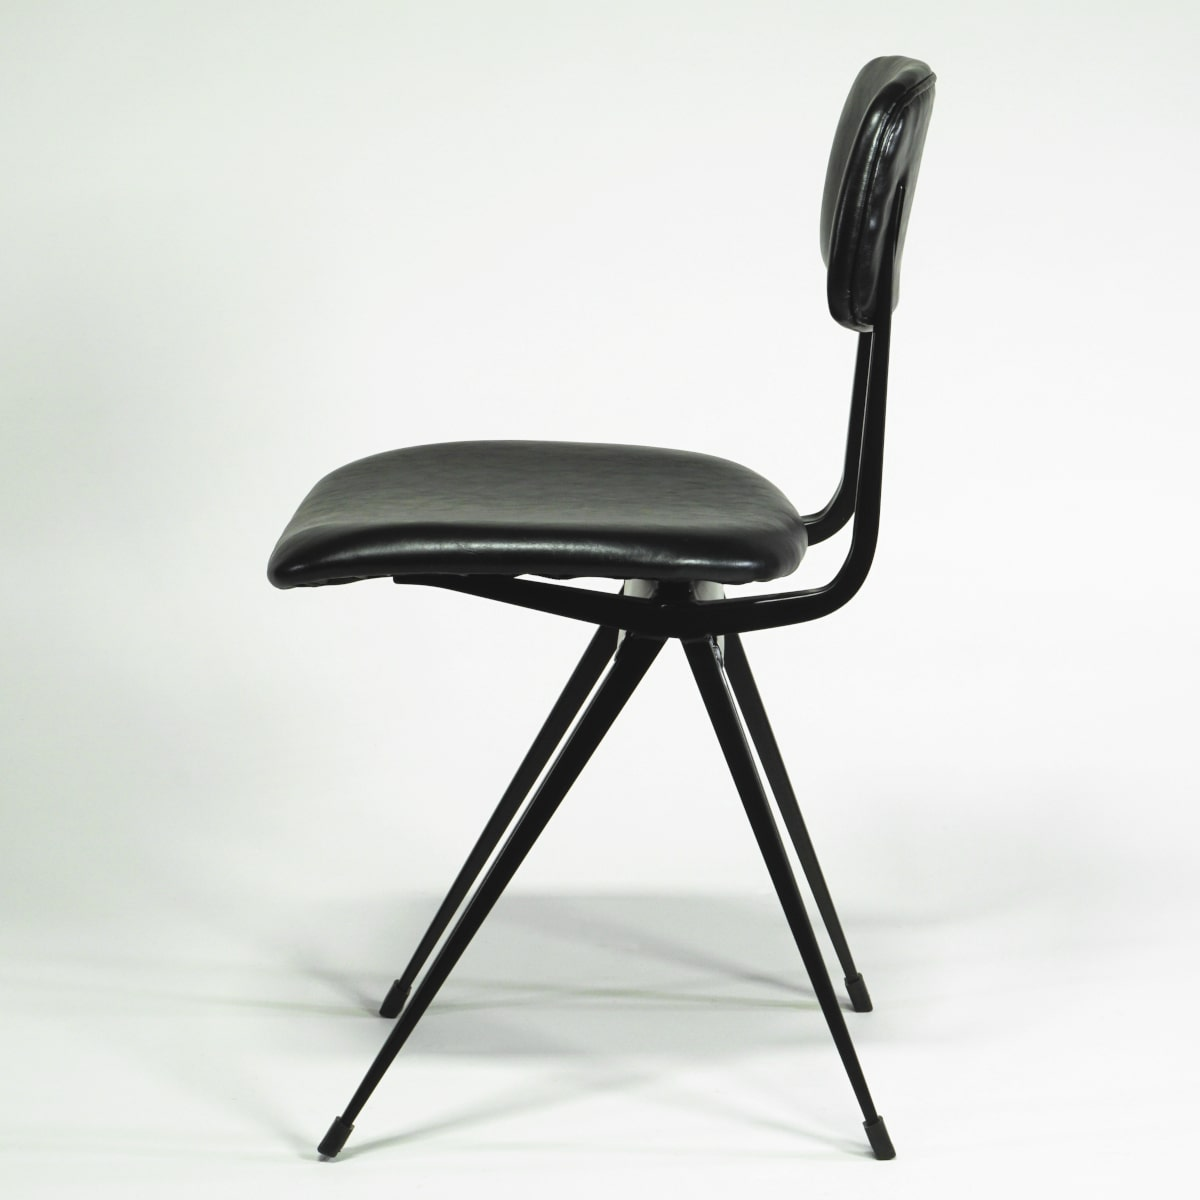 Schwarzer Stuhl gepolstert Metall